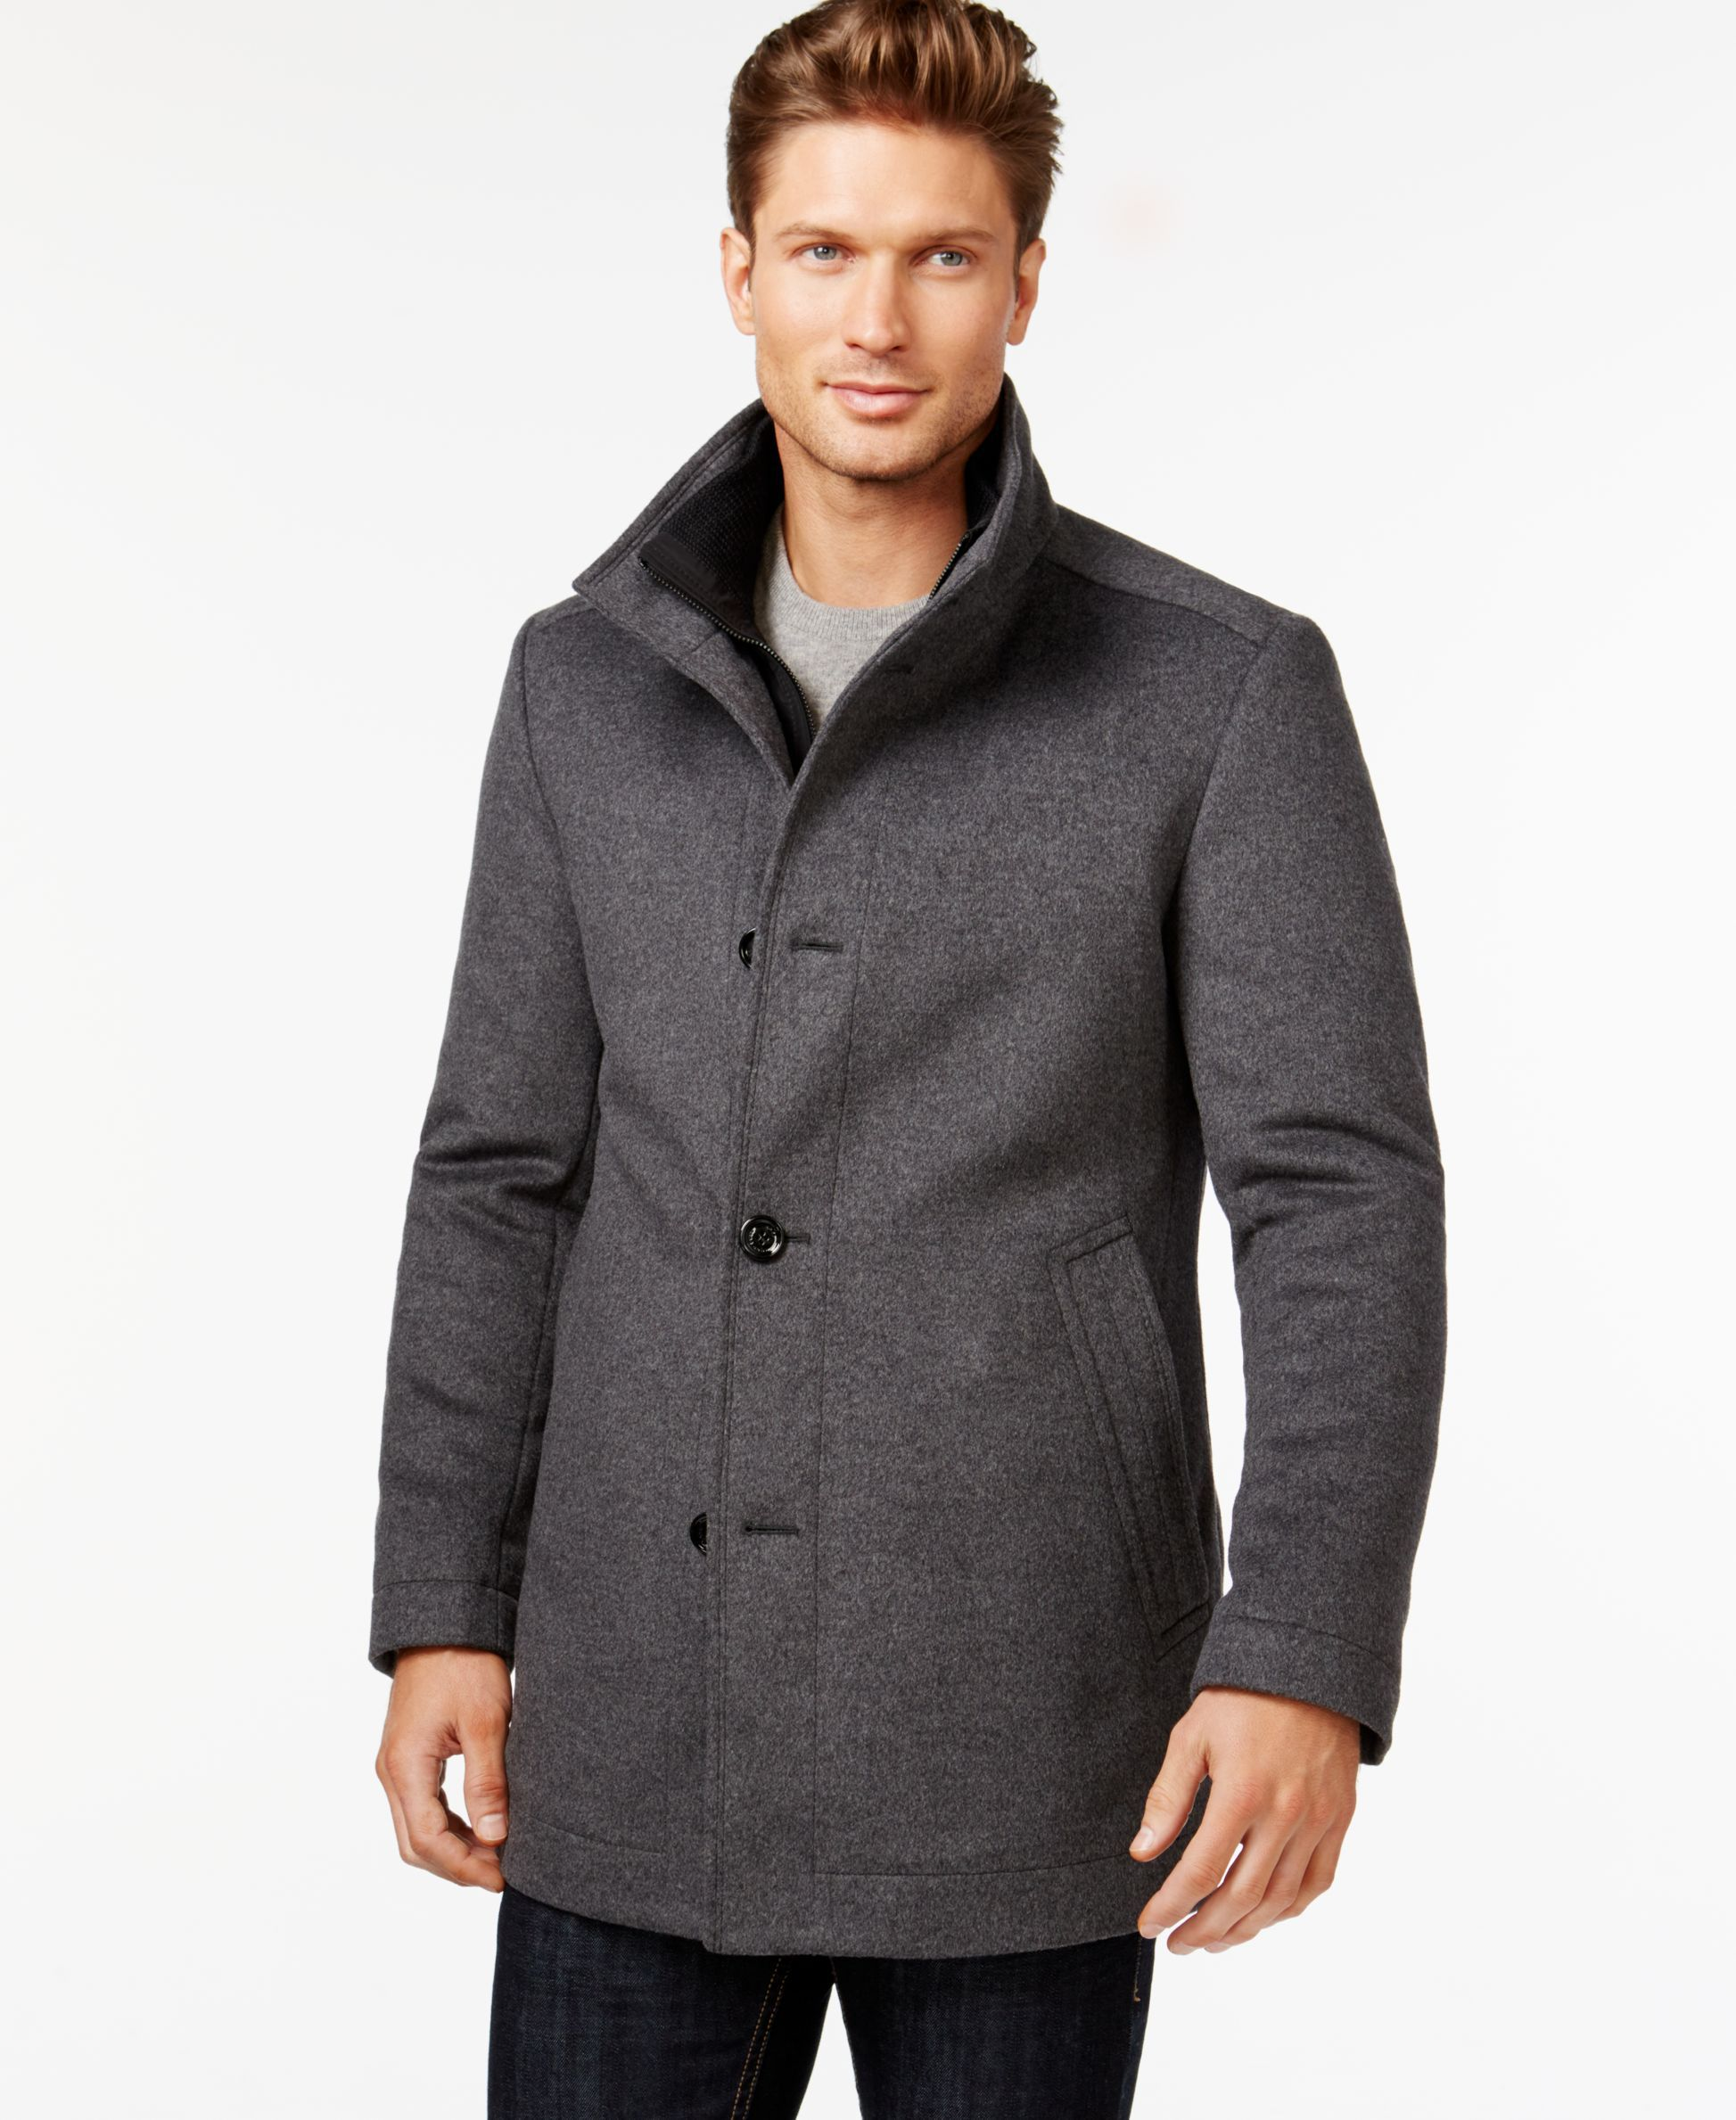 Boss Hugo Boss Coxtan Wool-Cashmere Coat | Products | Pinterest